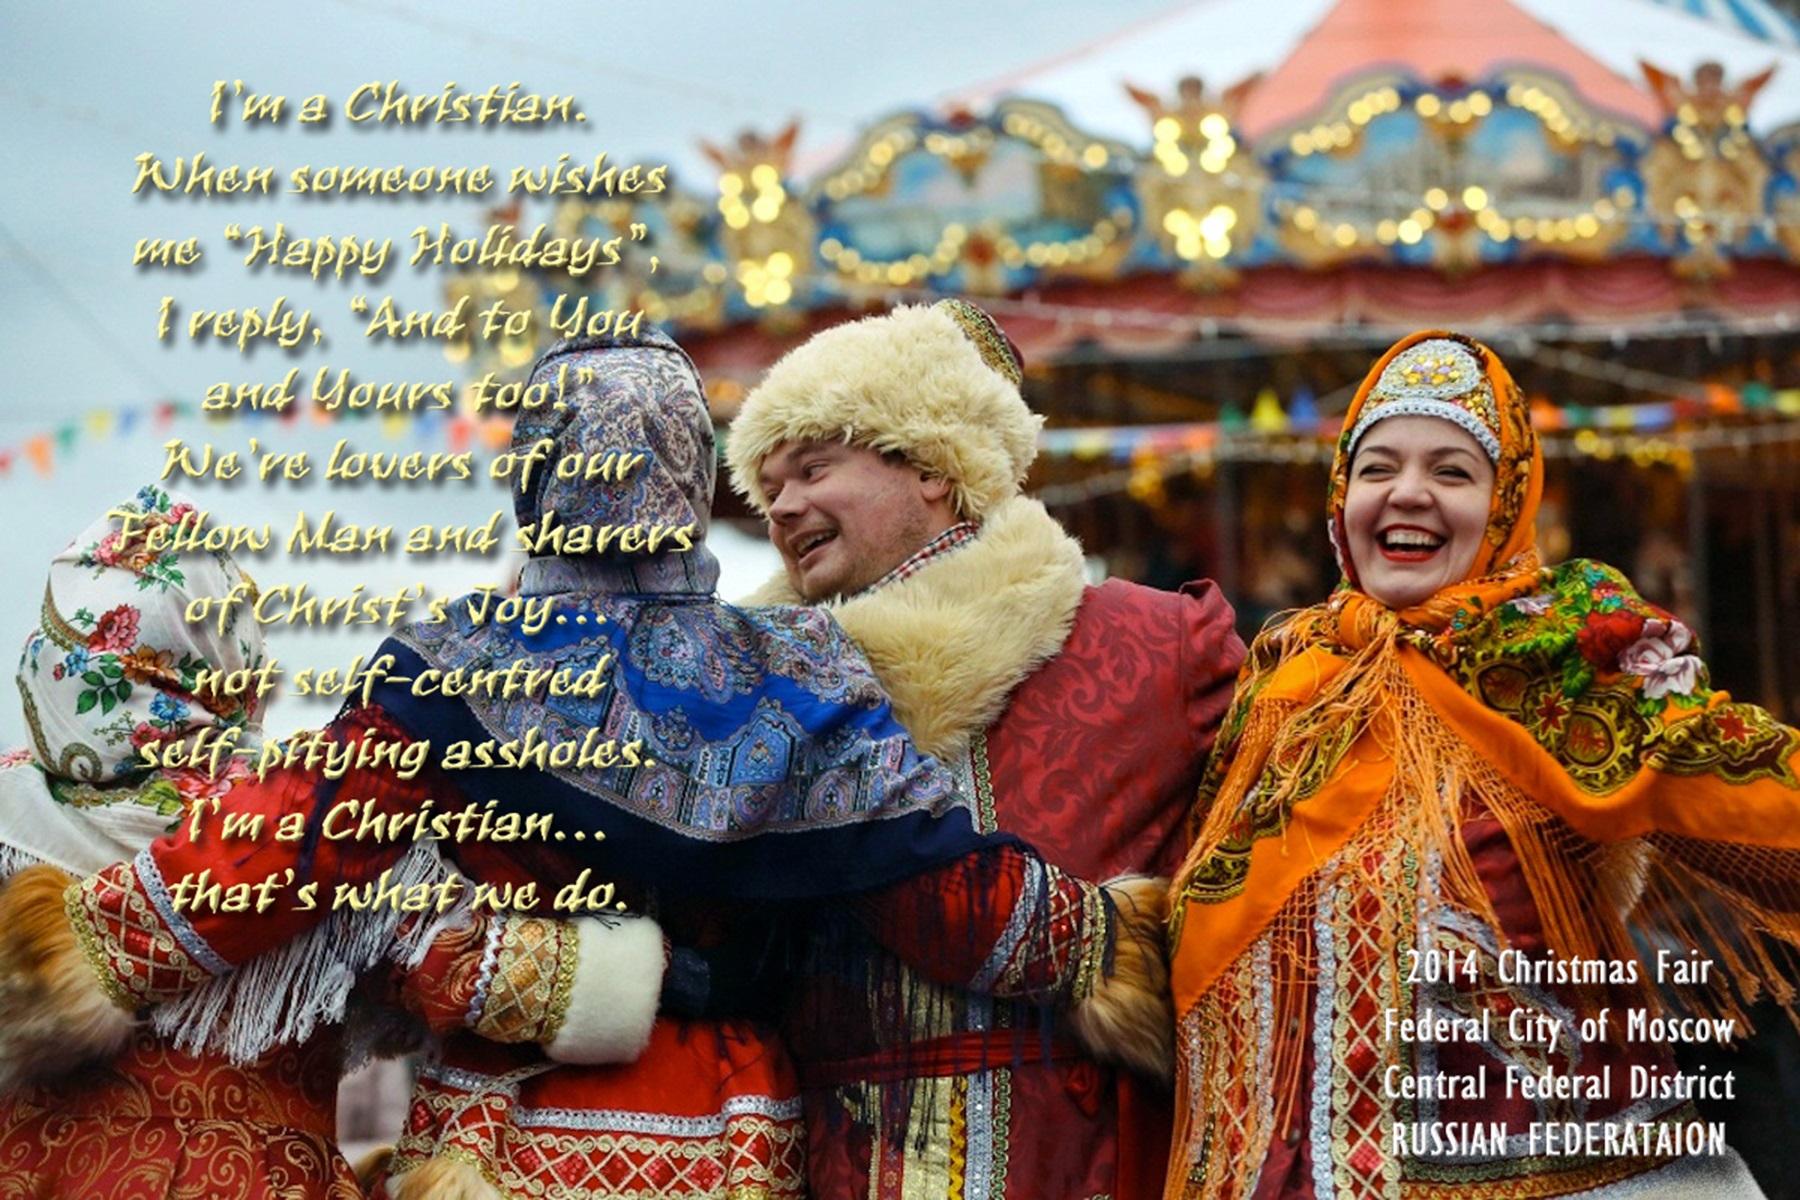 00 happy holidays christian 131215